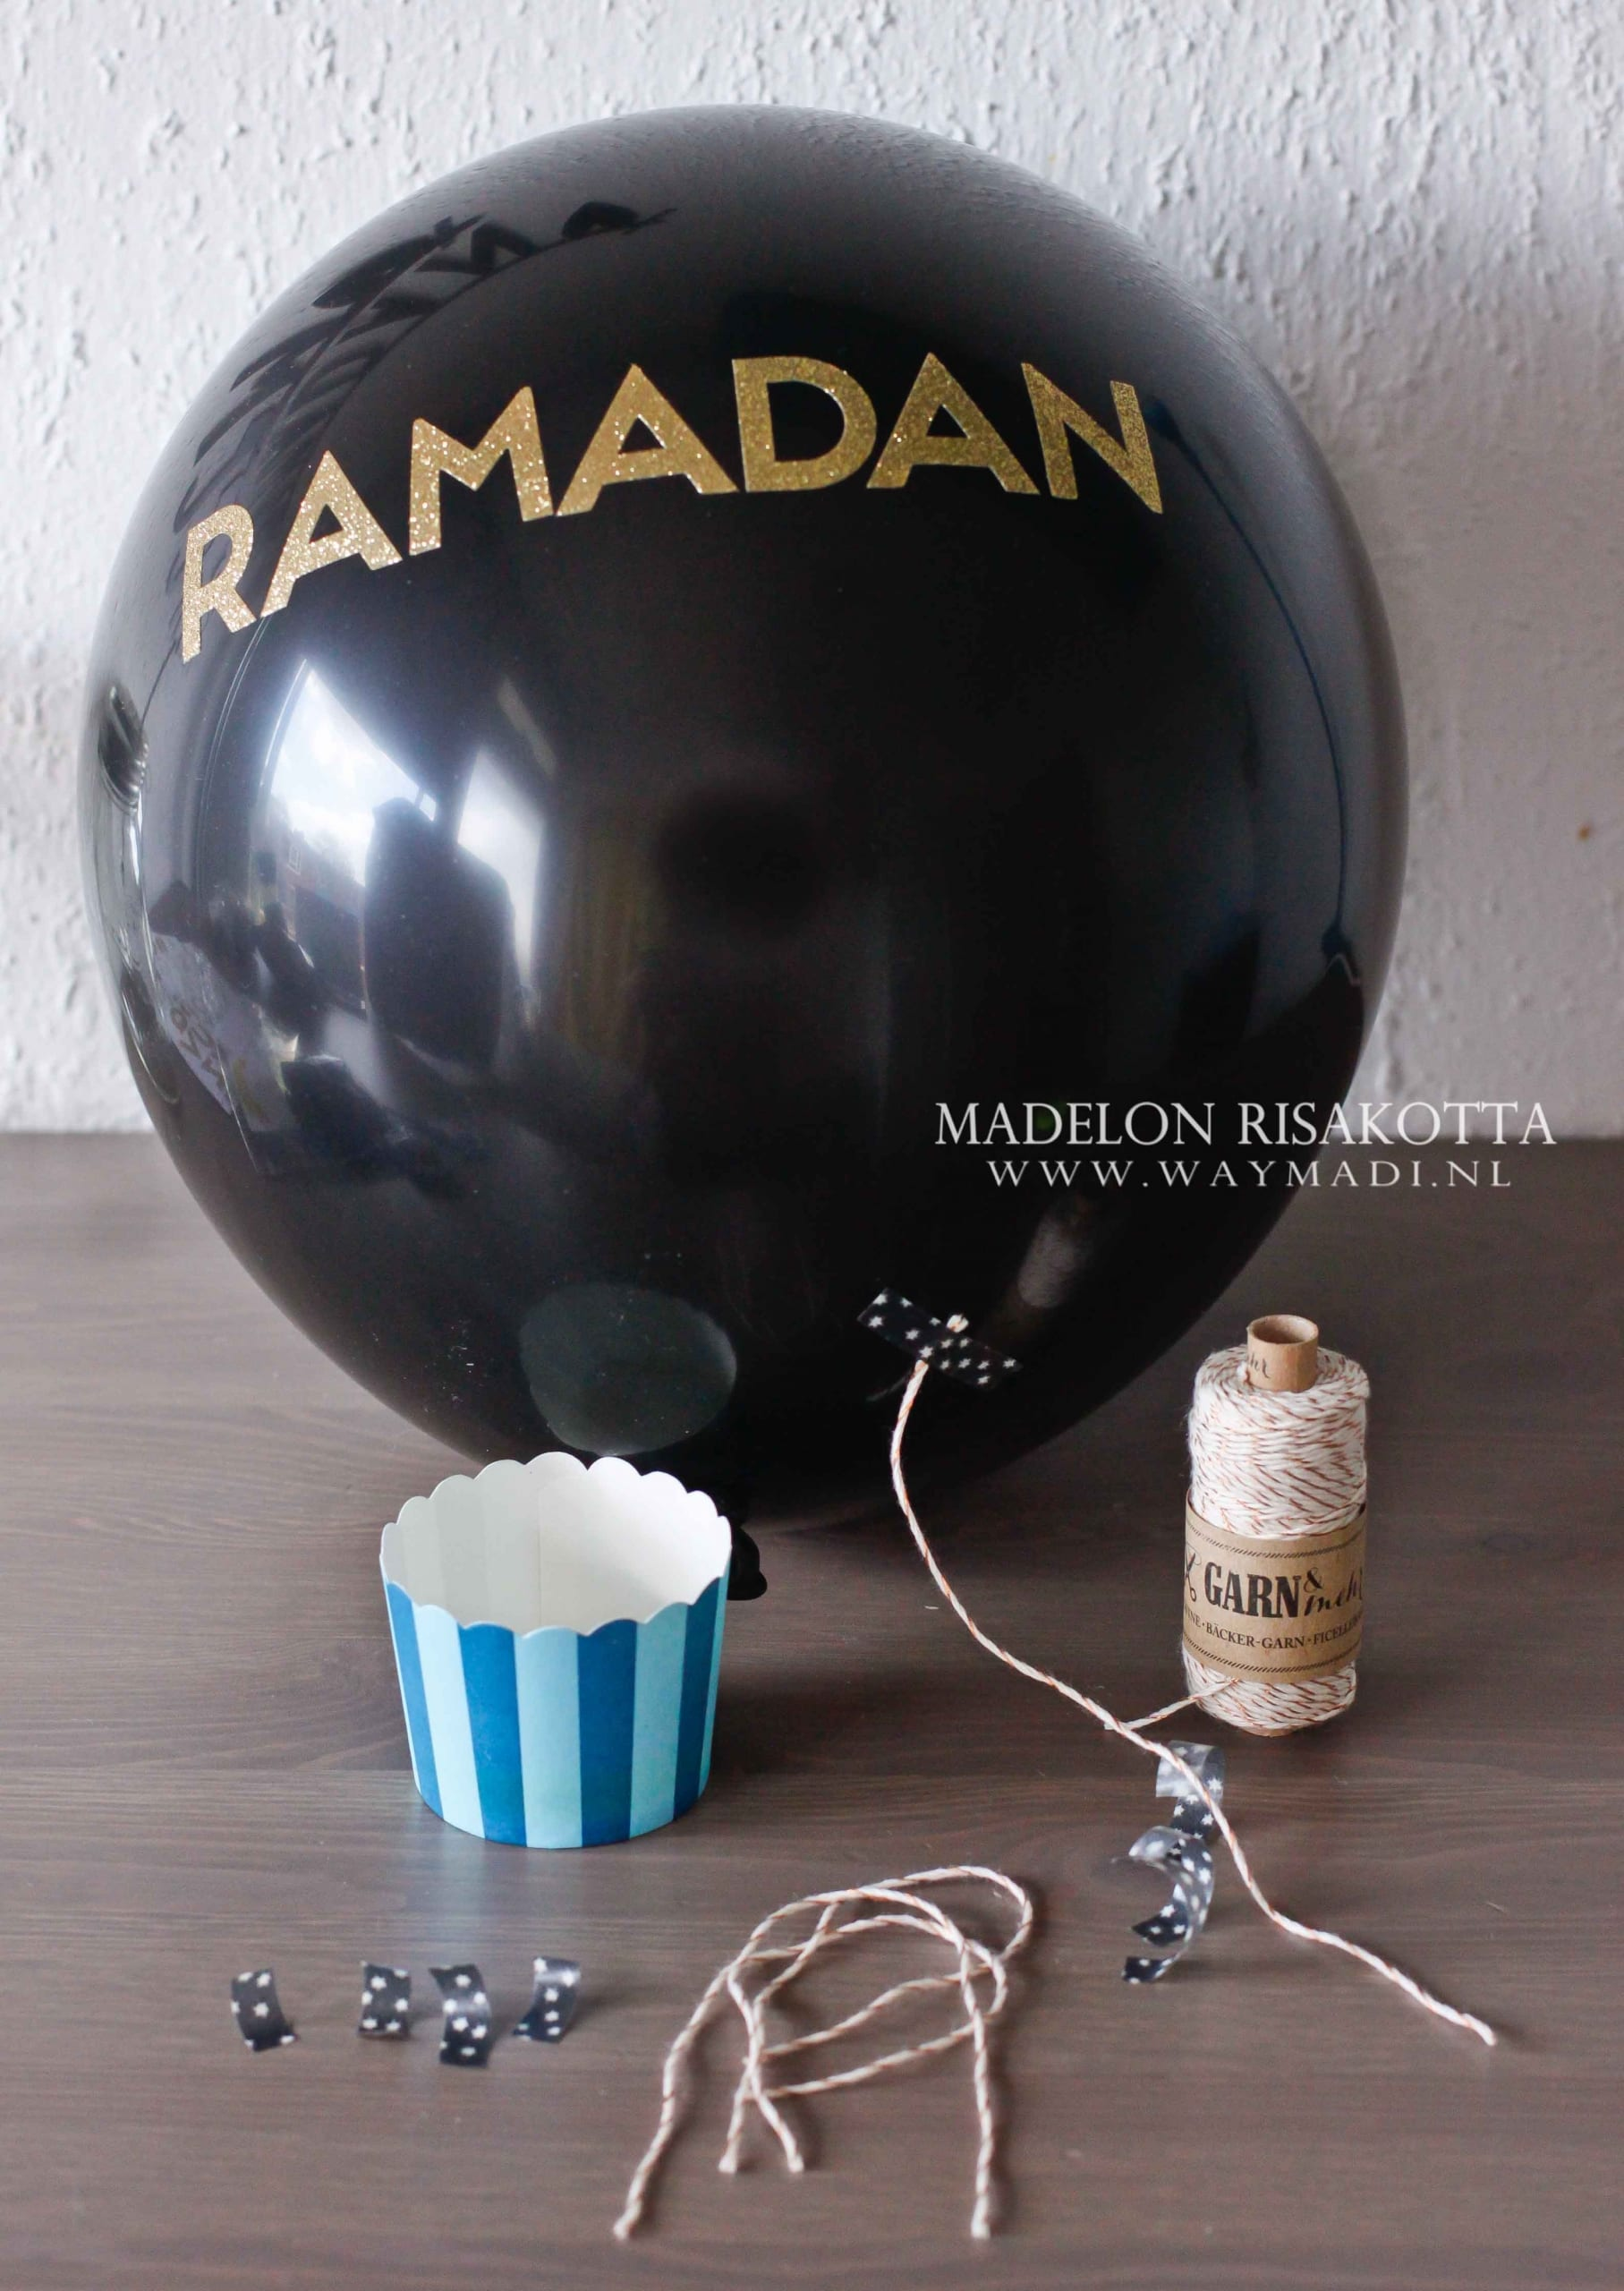 How to: Ramadan Ballon Maken! #Ramadanchallenge